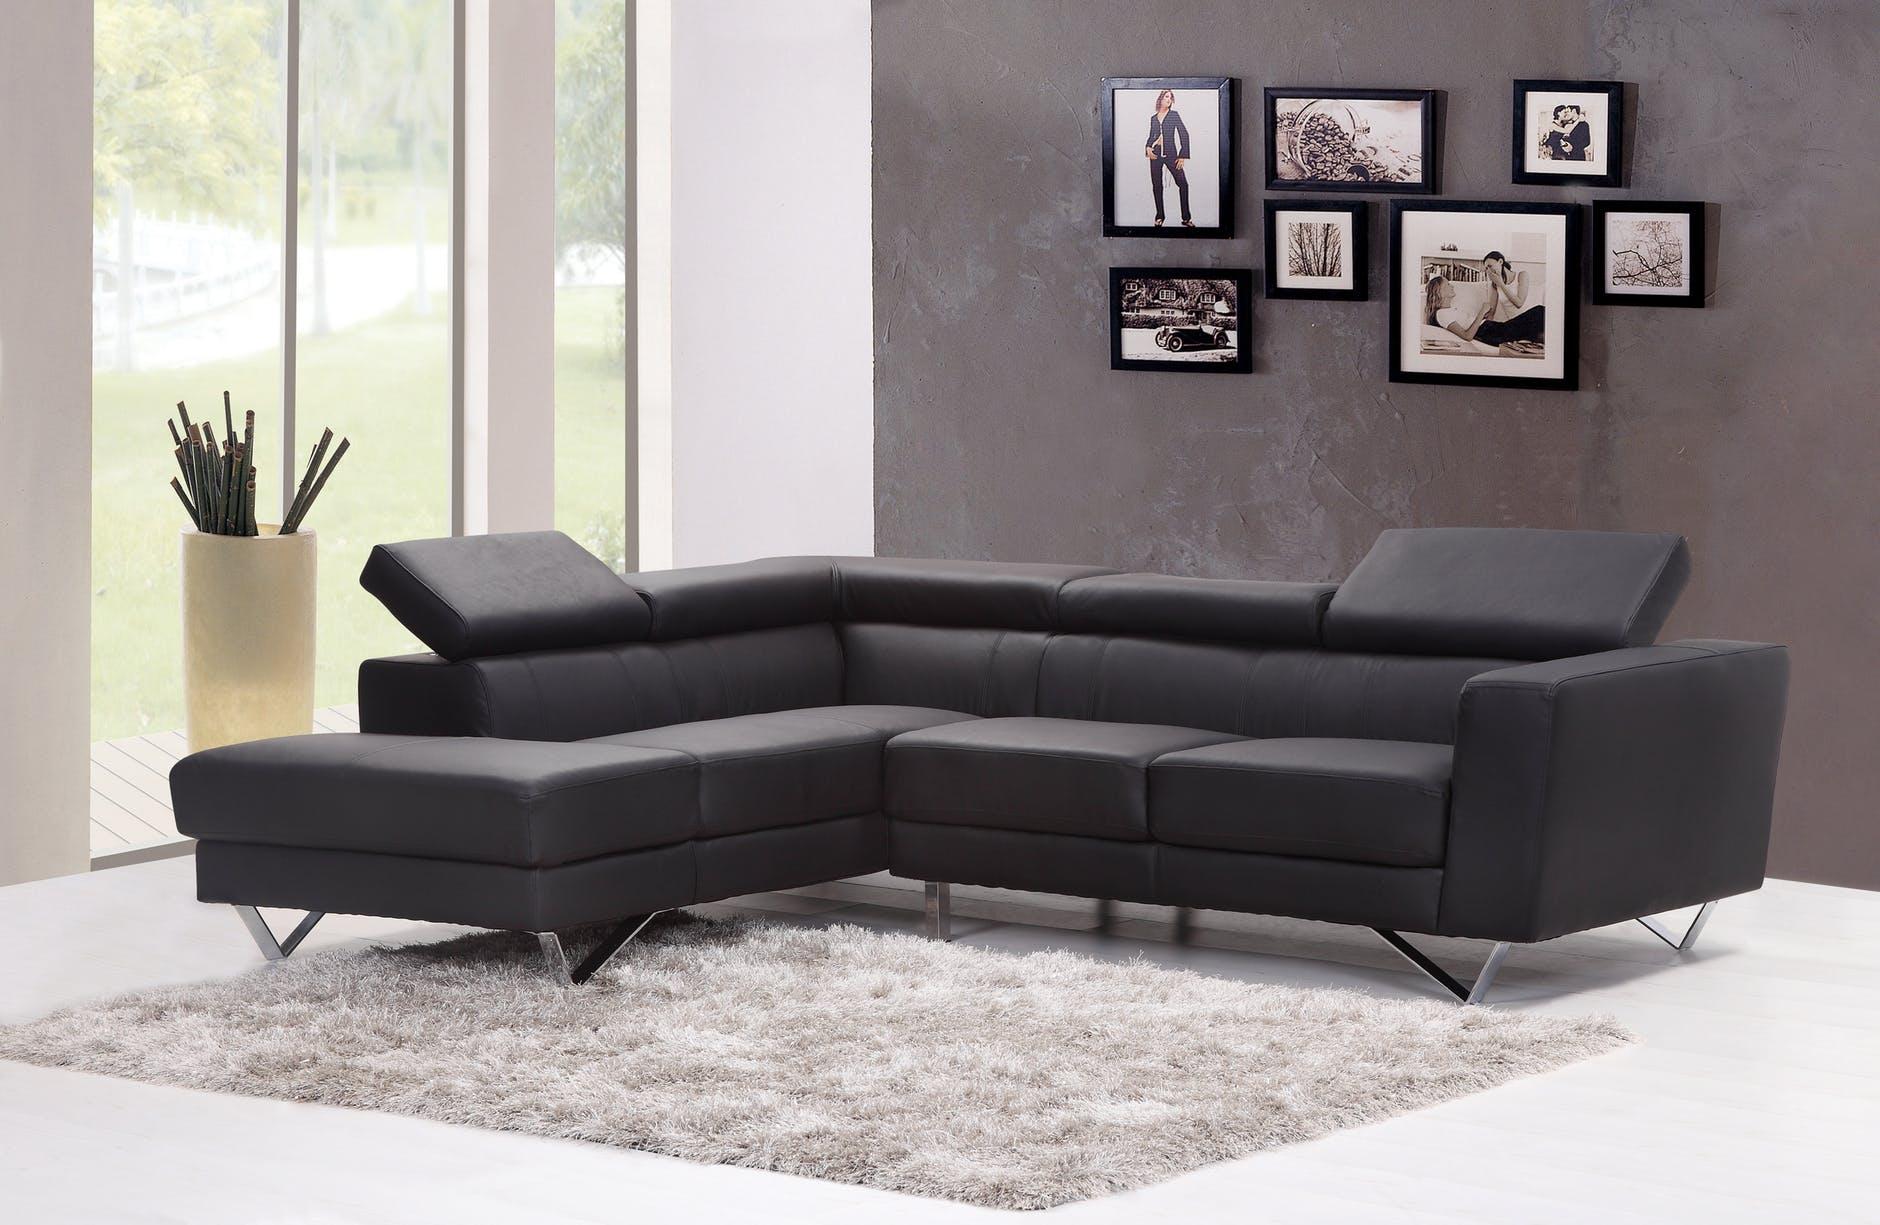 Rug Designs For Living Room 4